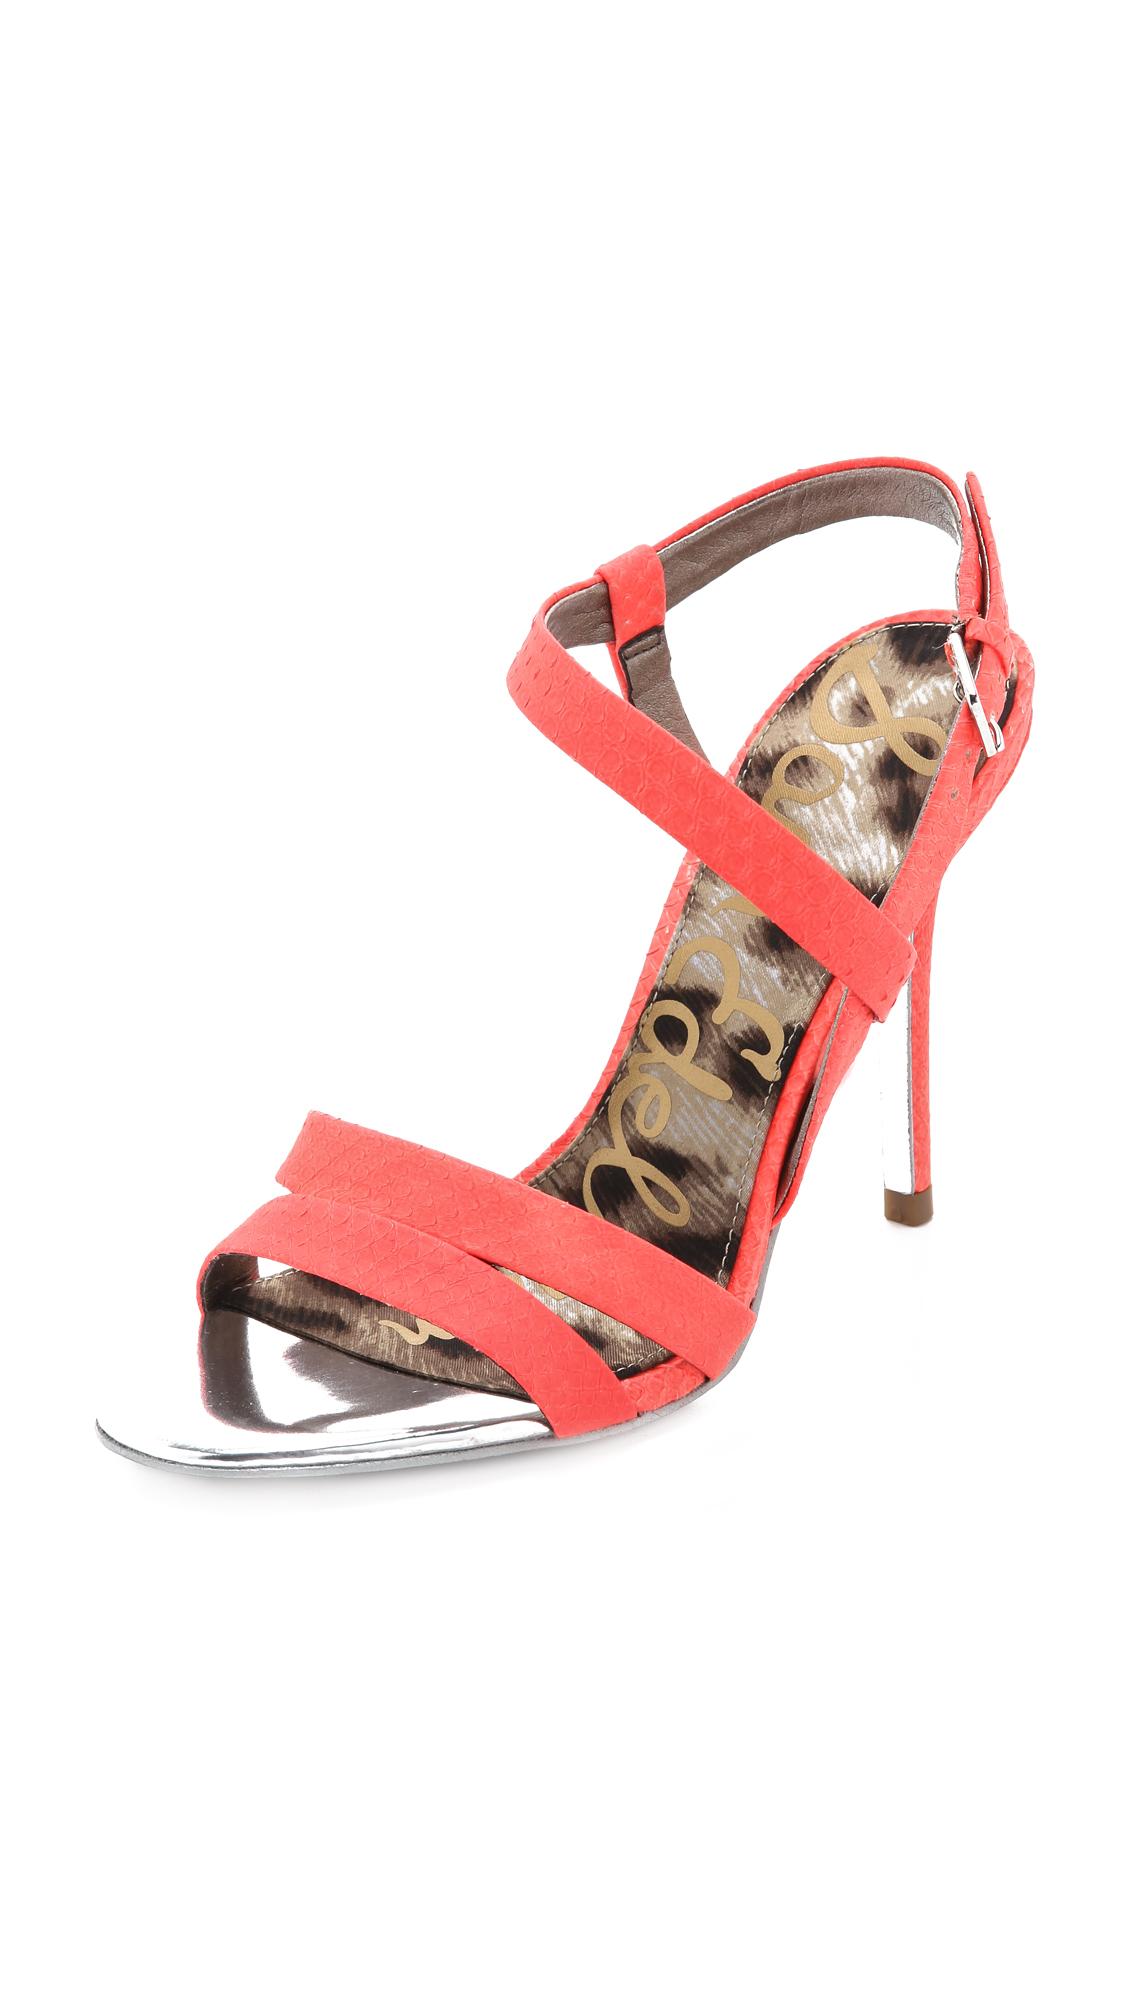 8efb2bbcf4e49 Sam Edelman Abbott High Heel Sandals